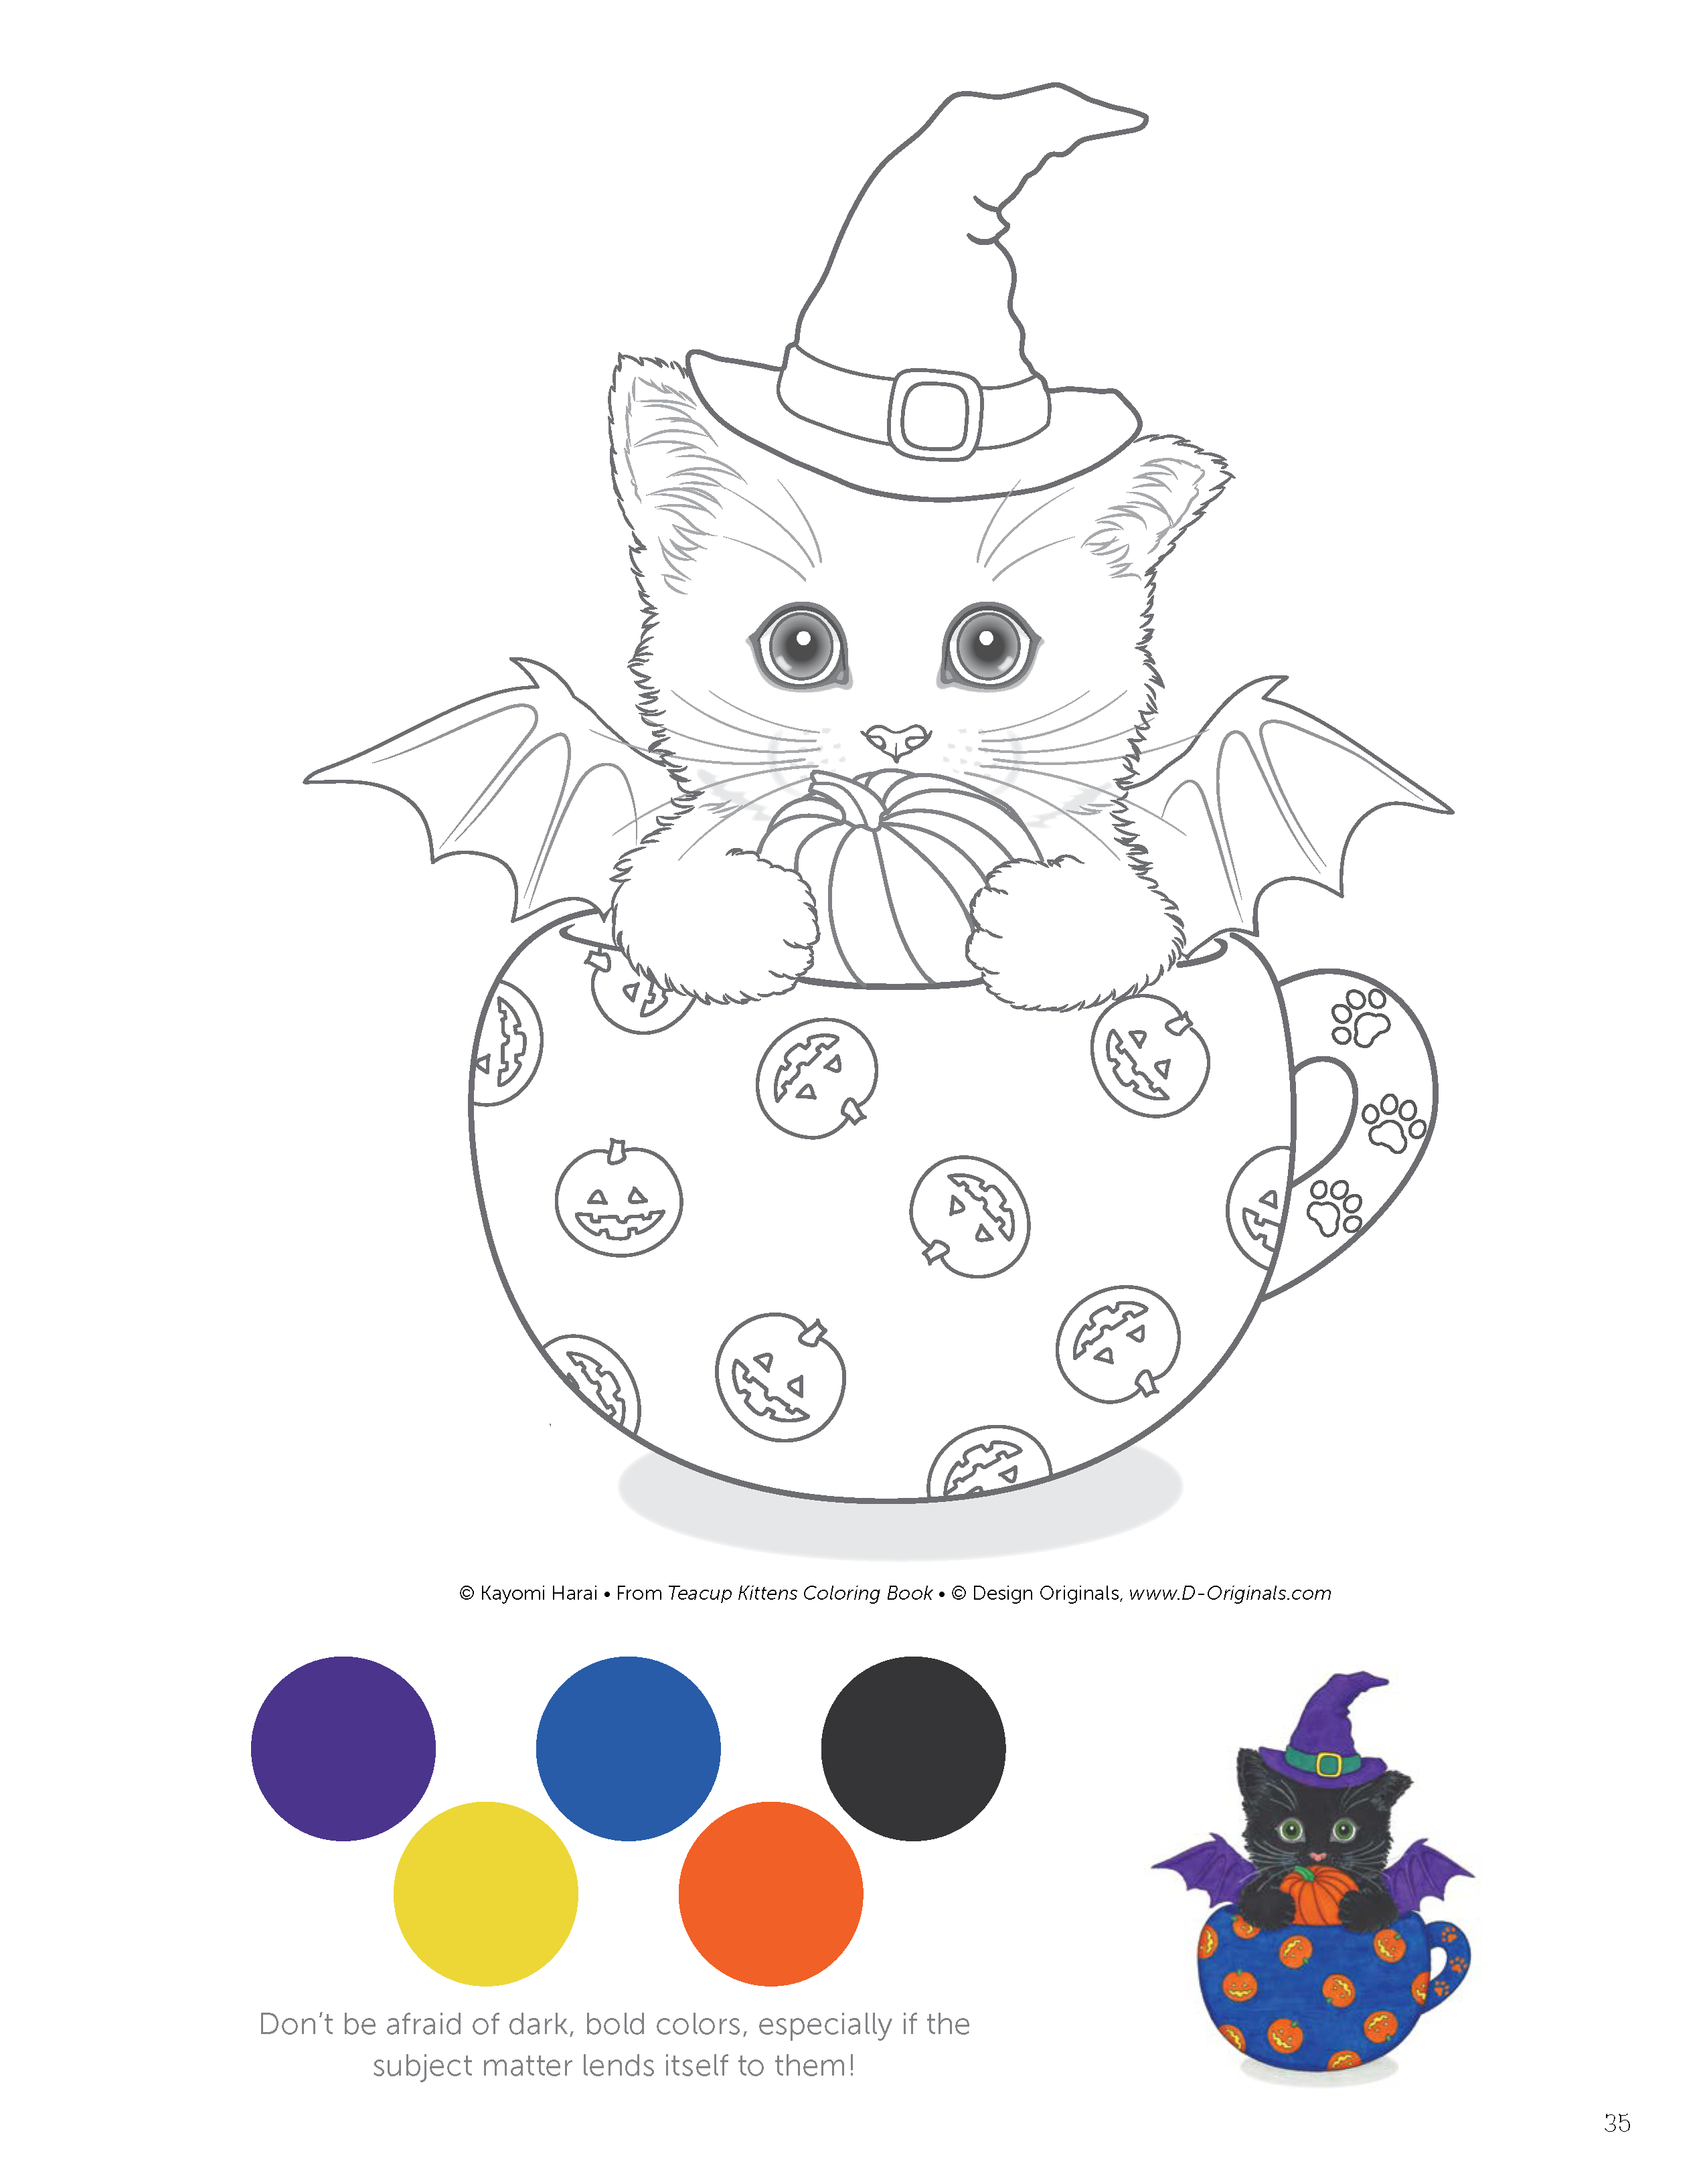 Teacup Kittens Coloring Book (Design Originals) 32 Adorable ...